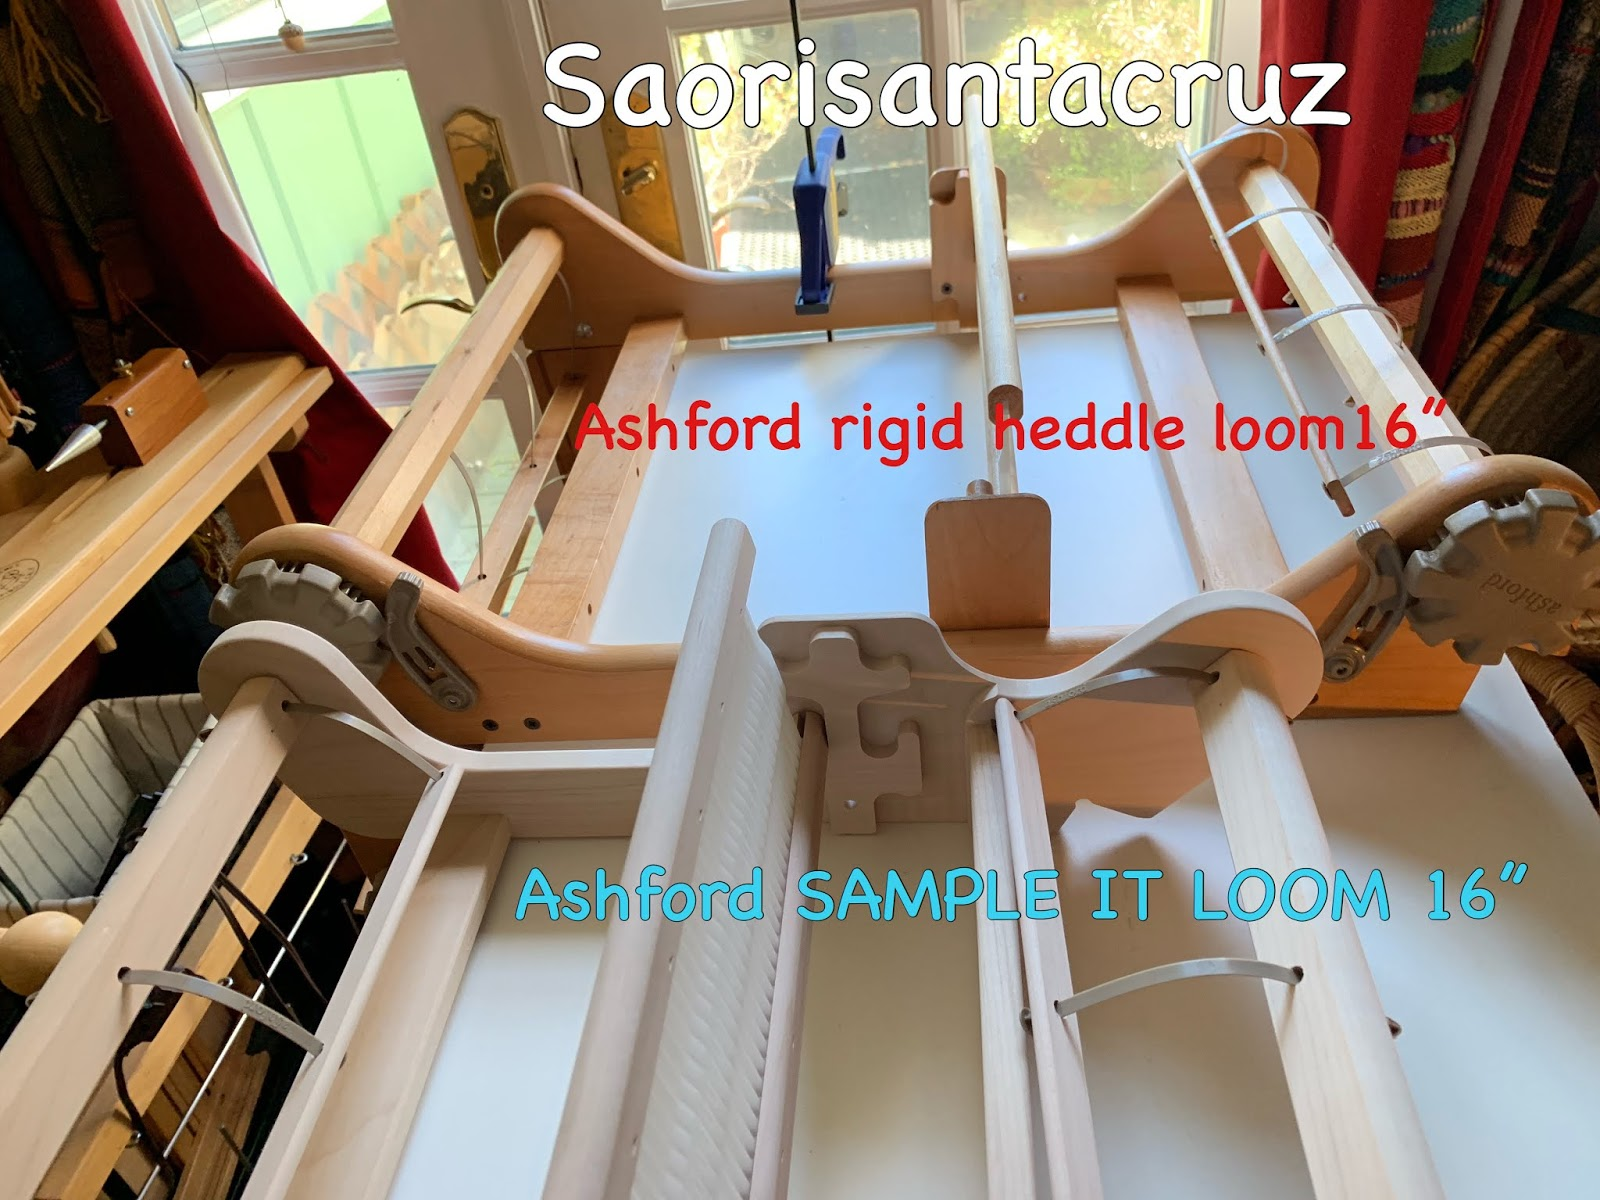 CENTERING WITH FIBER: Ashford rigid heddle loom comparisoms